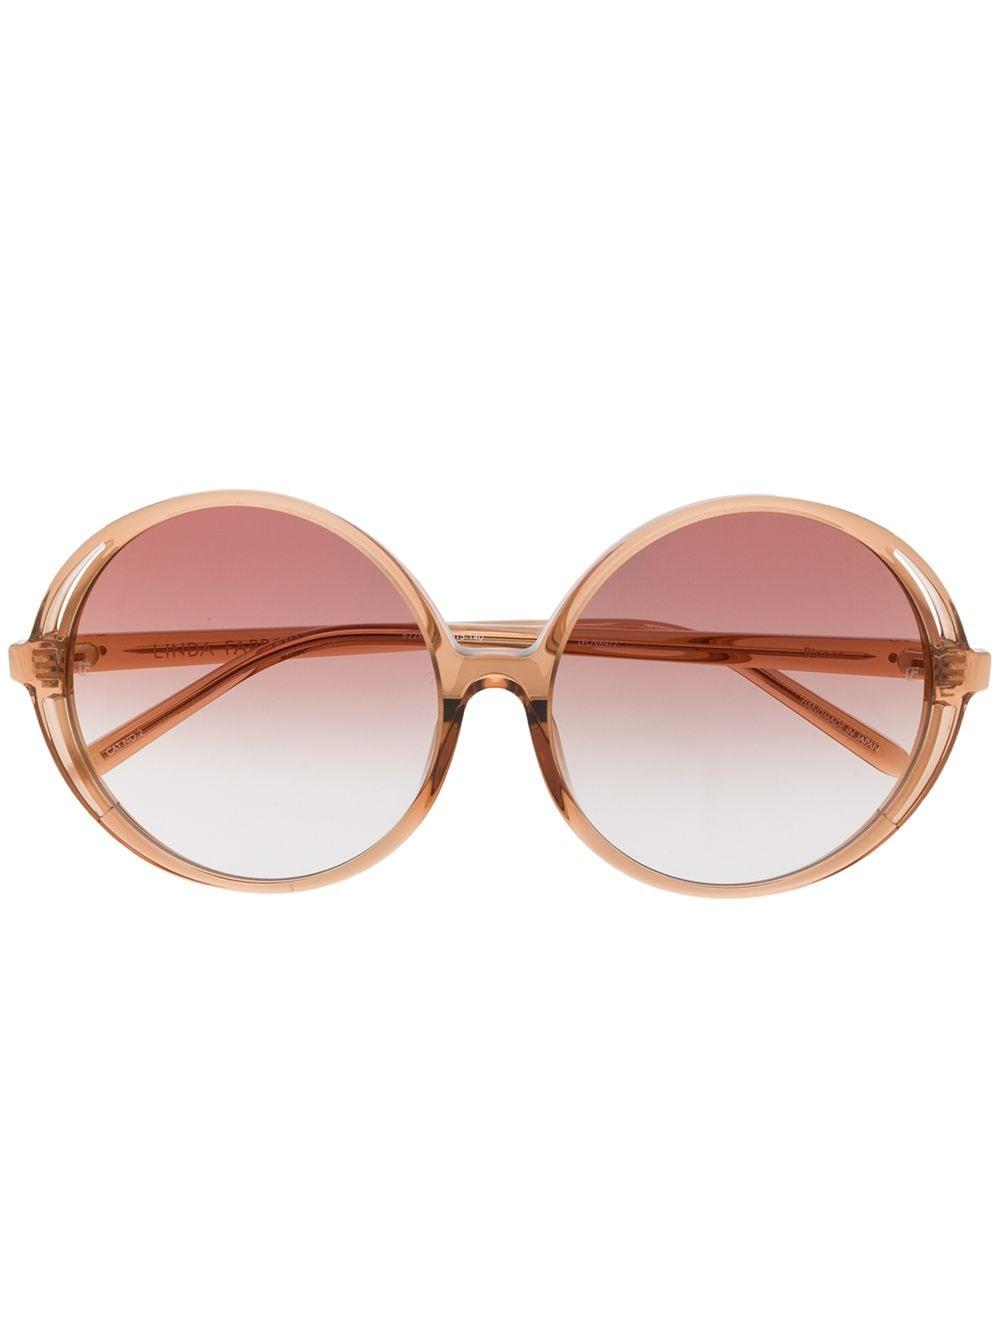 Linda Farrow 'Bianca' Sonnenbrille - Braun